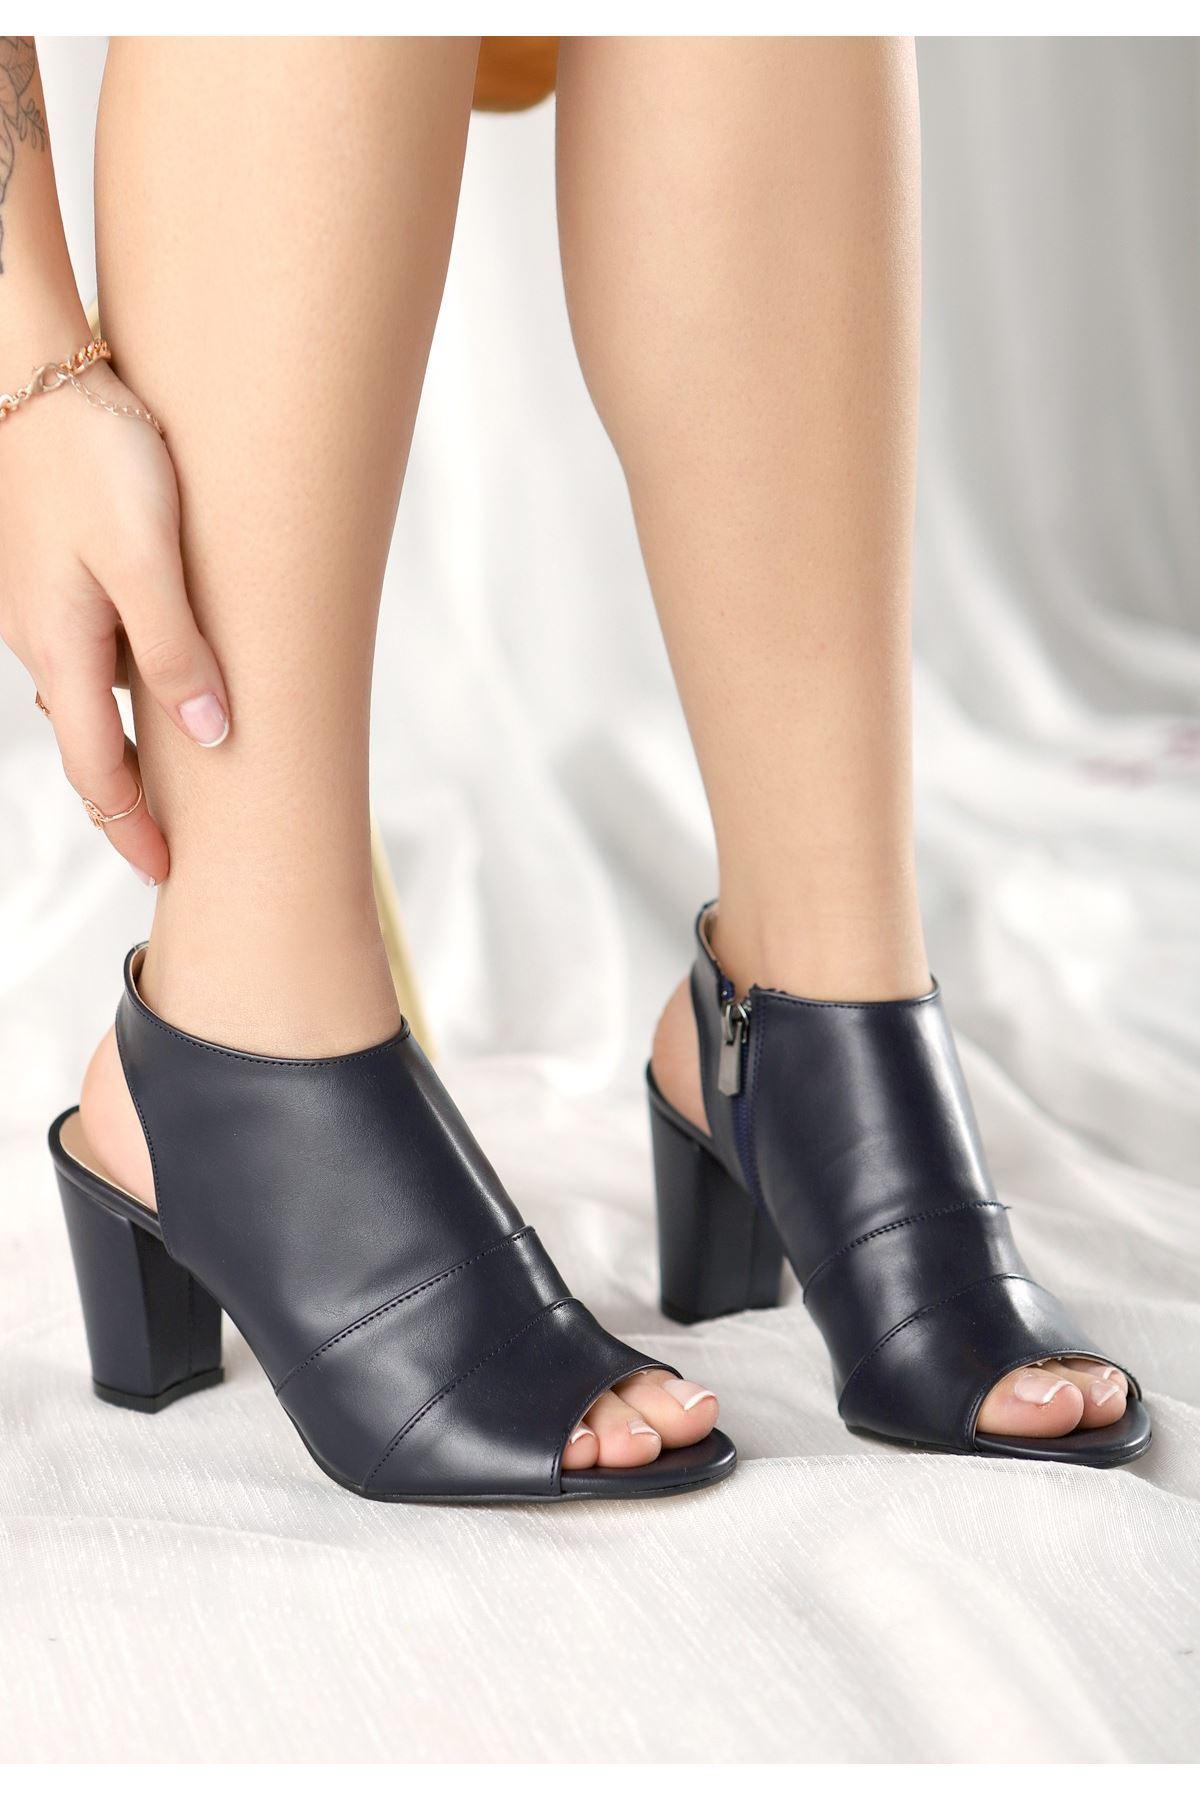 Dolly Lacivert Cilt Topuklu Ayakkabı